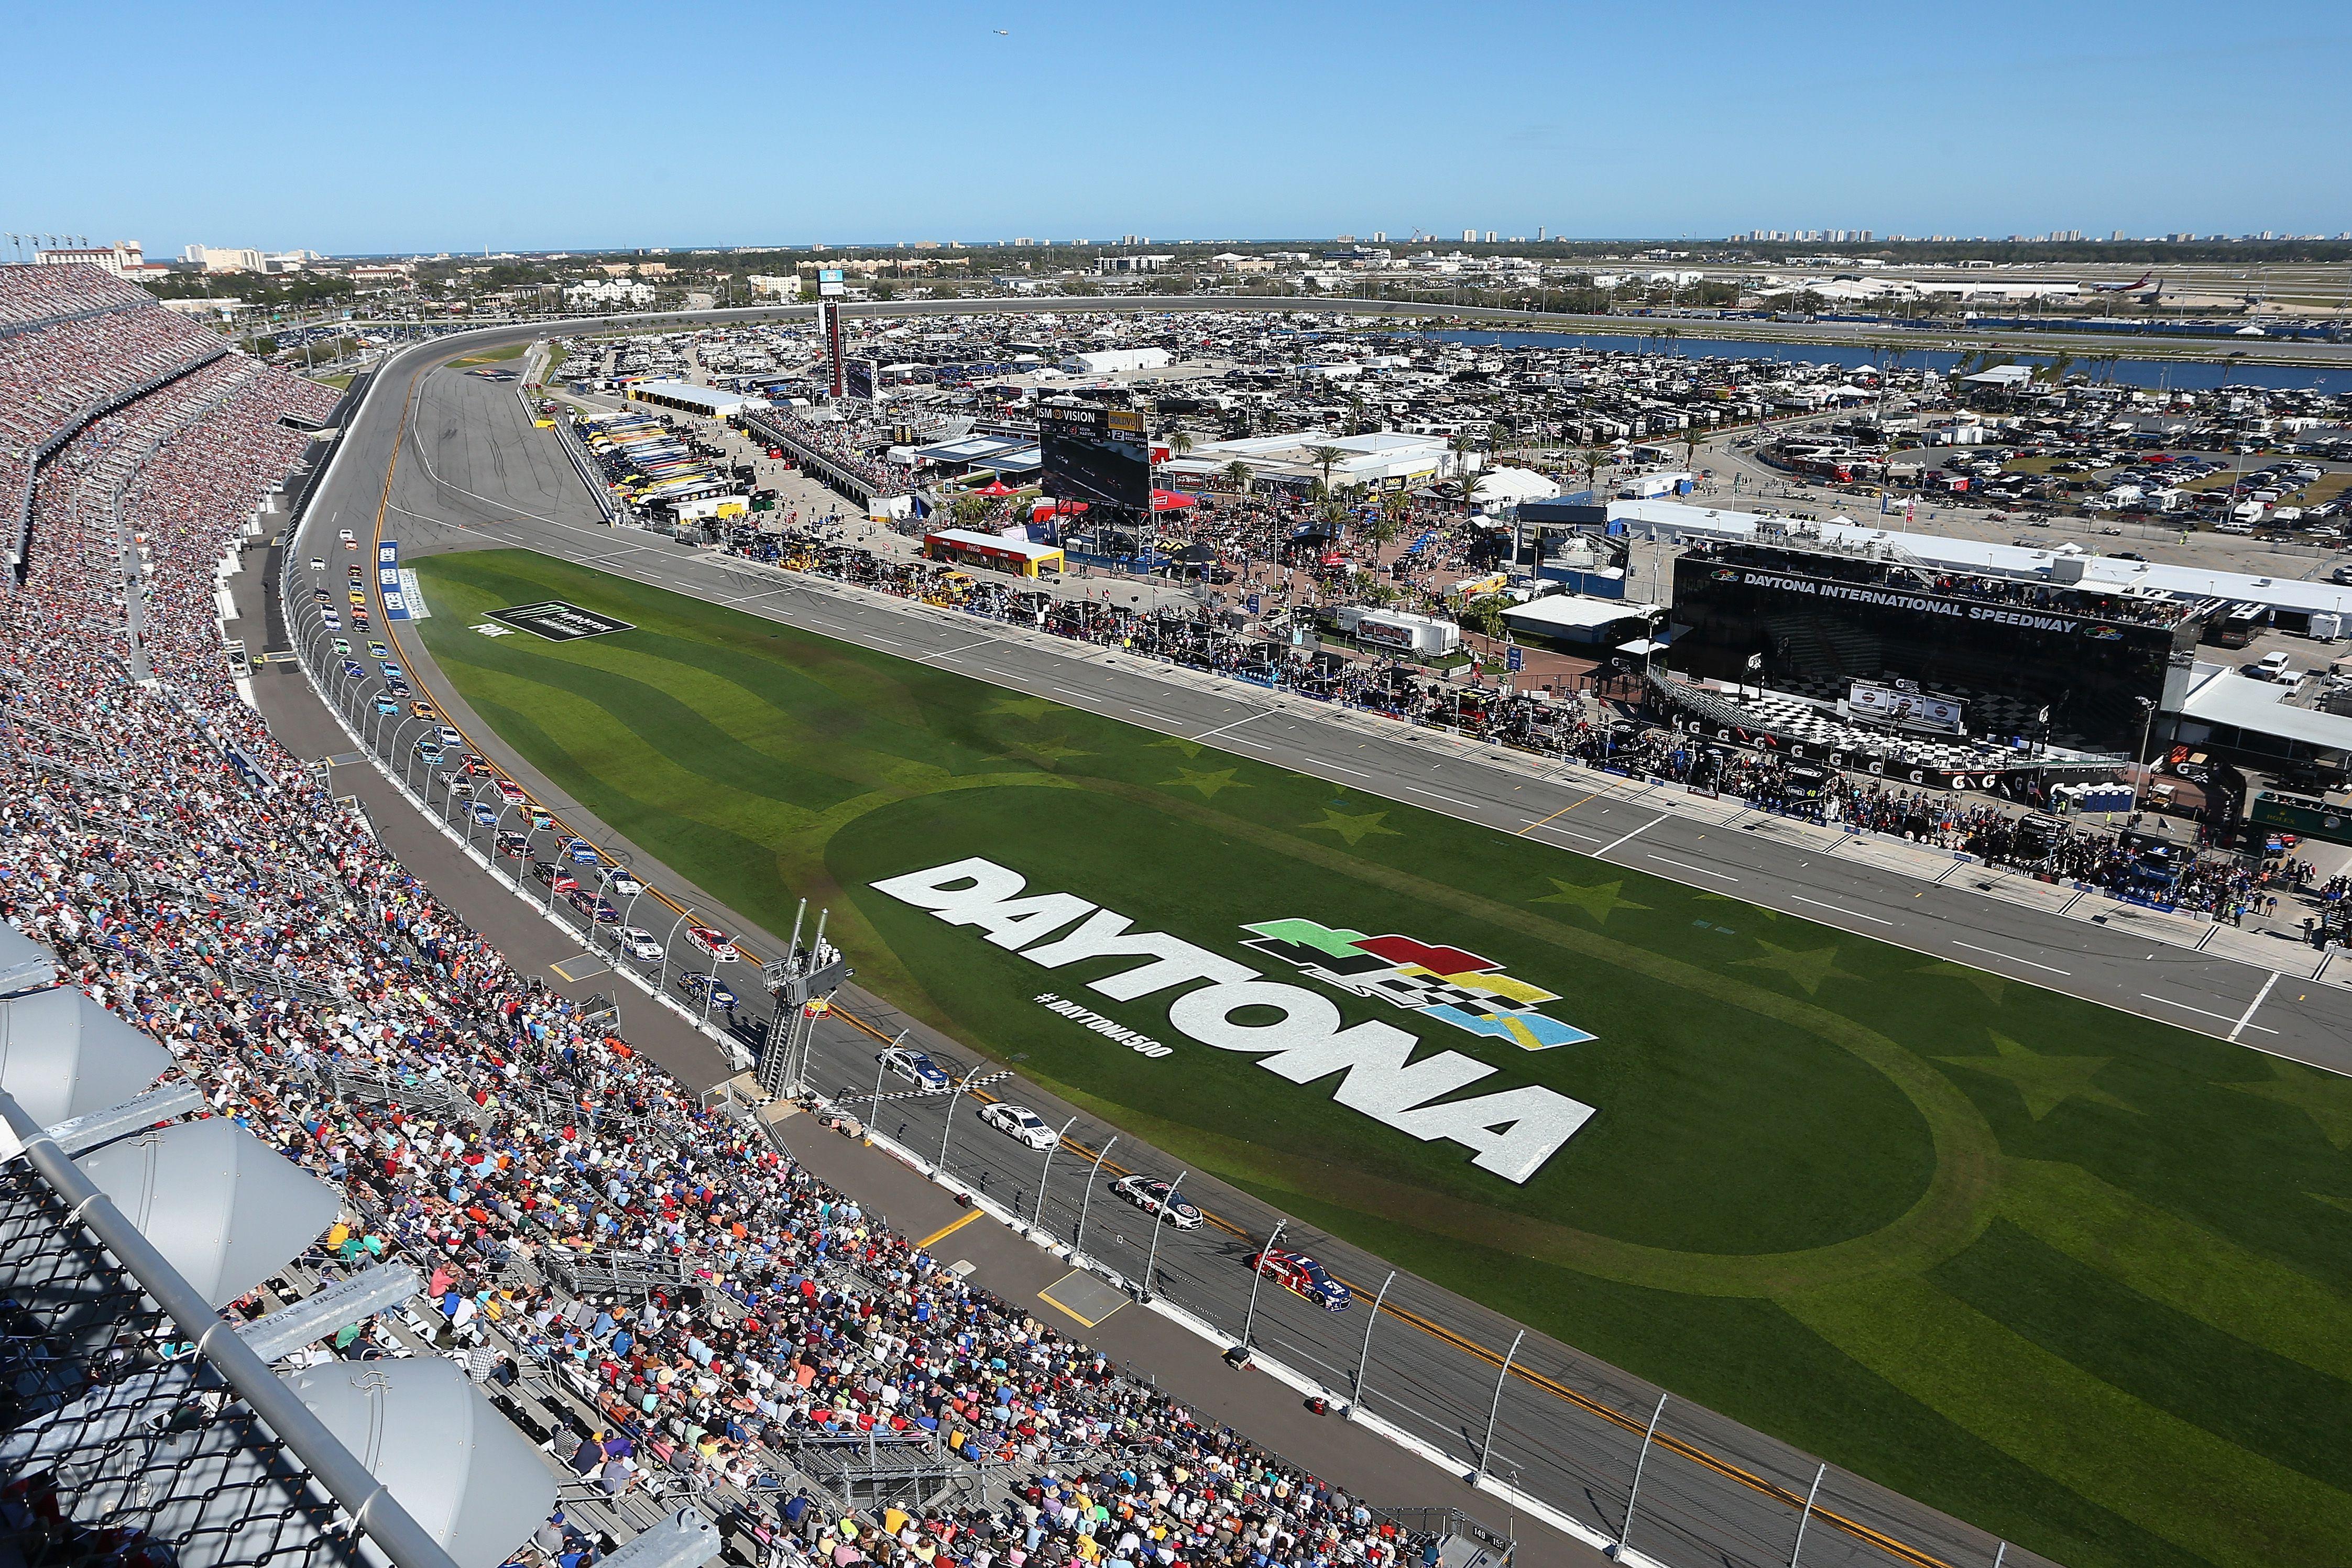 Daytona International Speedway from above